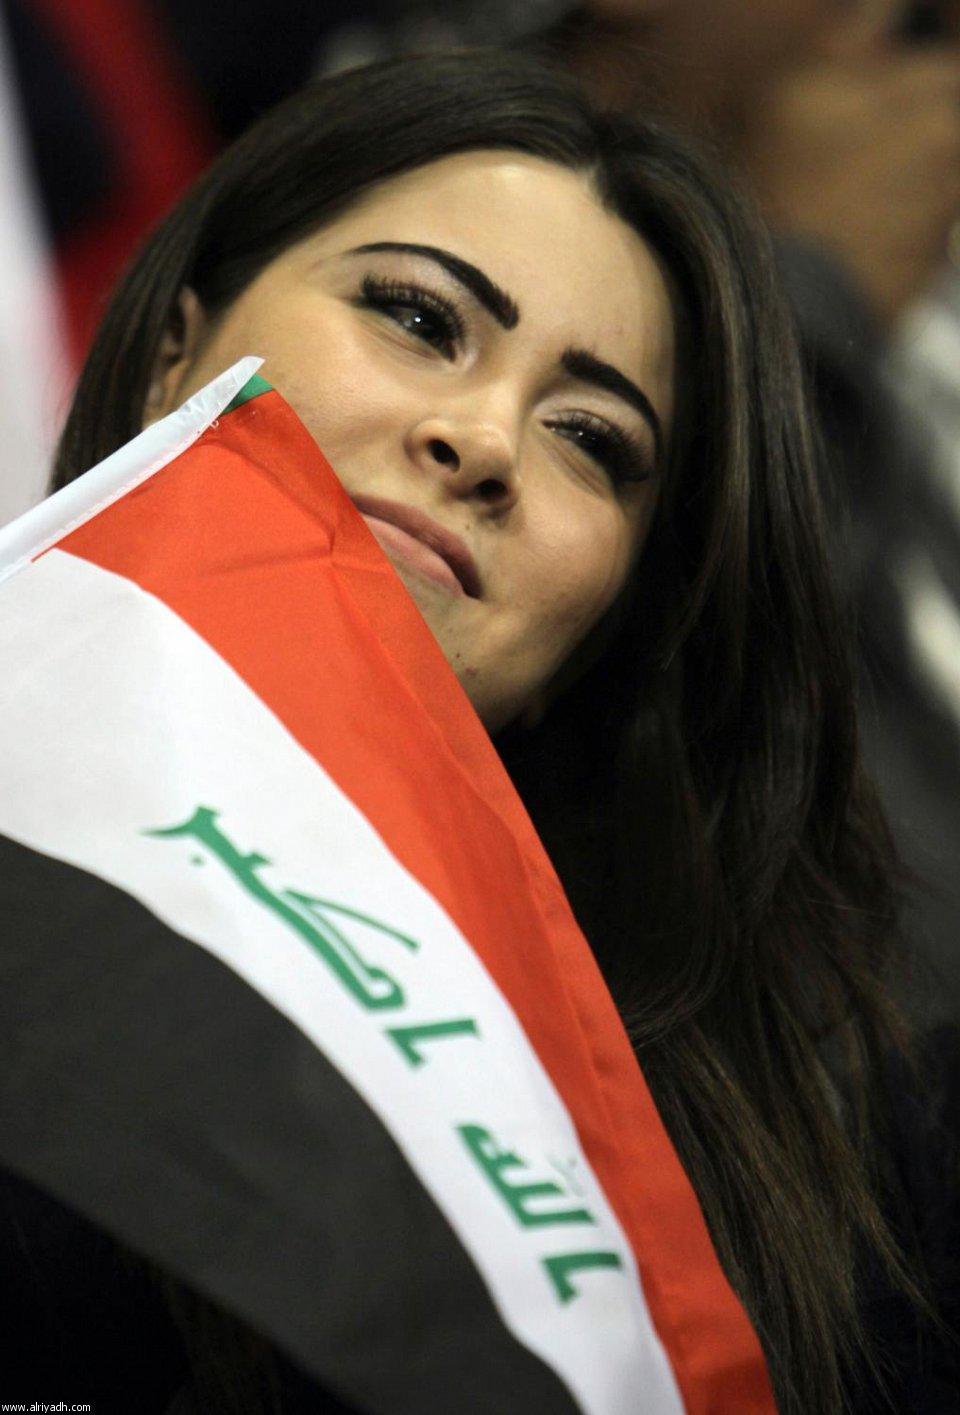 صورة مكنتش اعرف انهم حلوين كده ,بنات البحرين